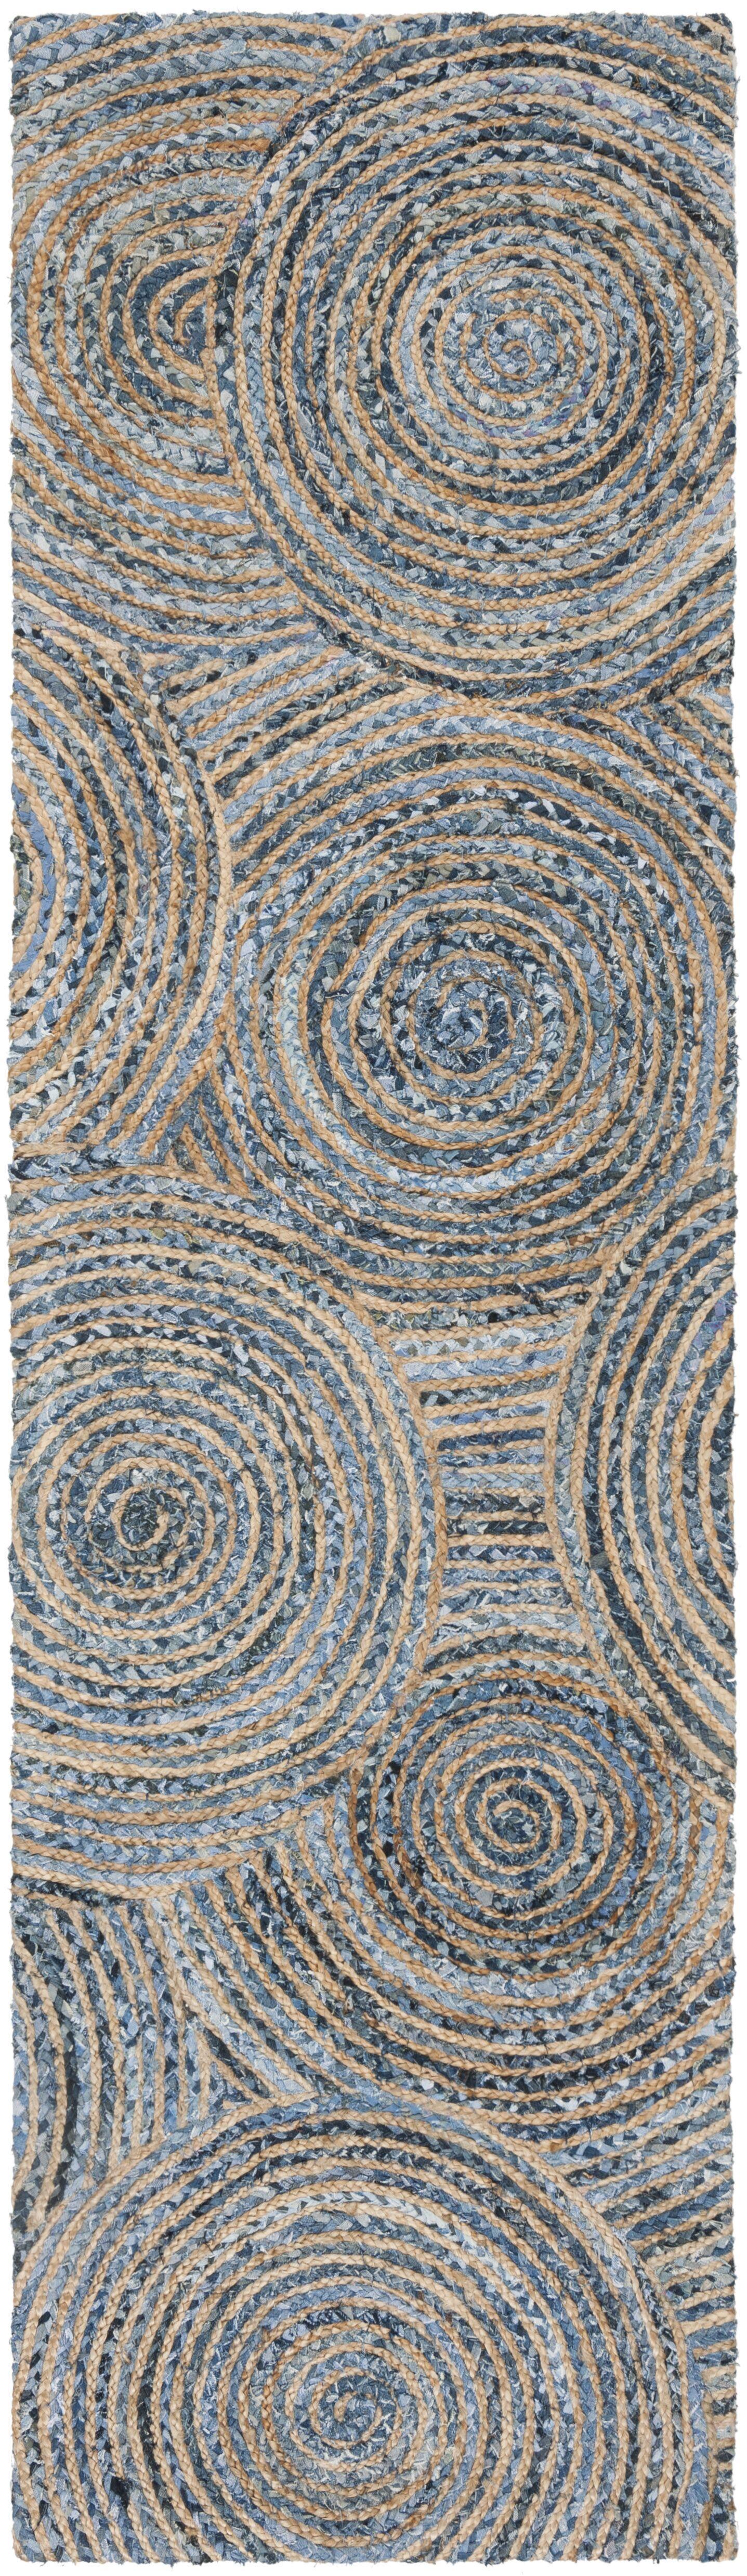 Abhay Hand Woven Gray/Blue Area Rug Rug Size: Runner 2'3